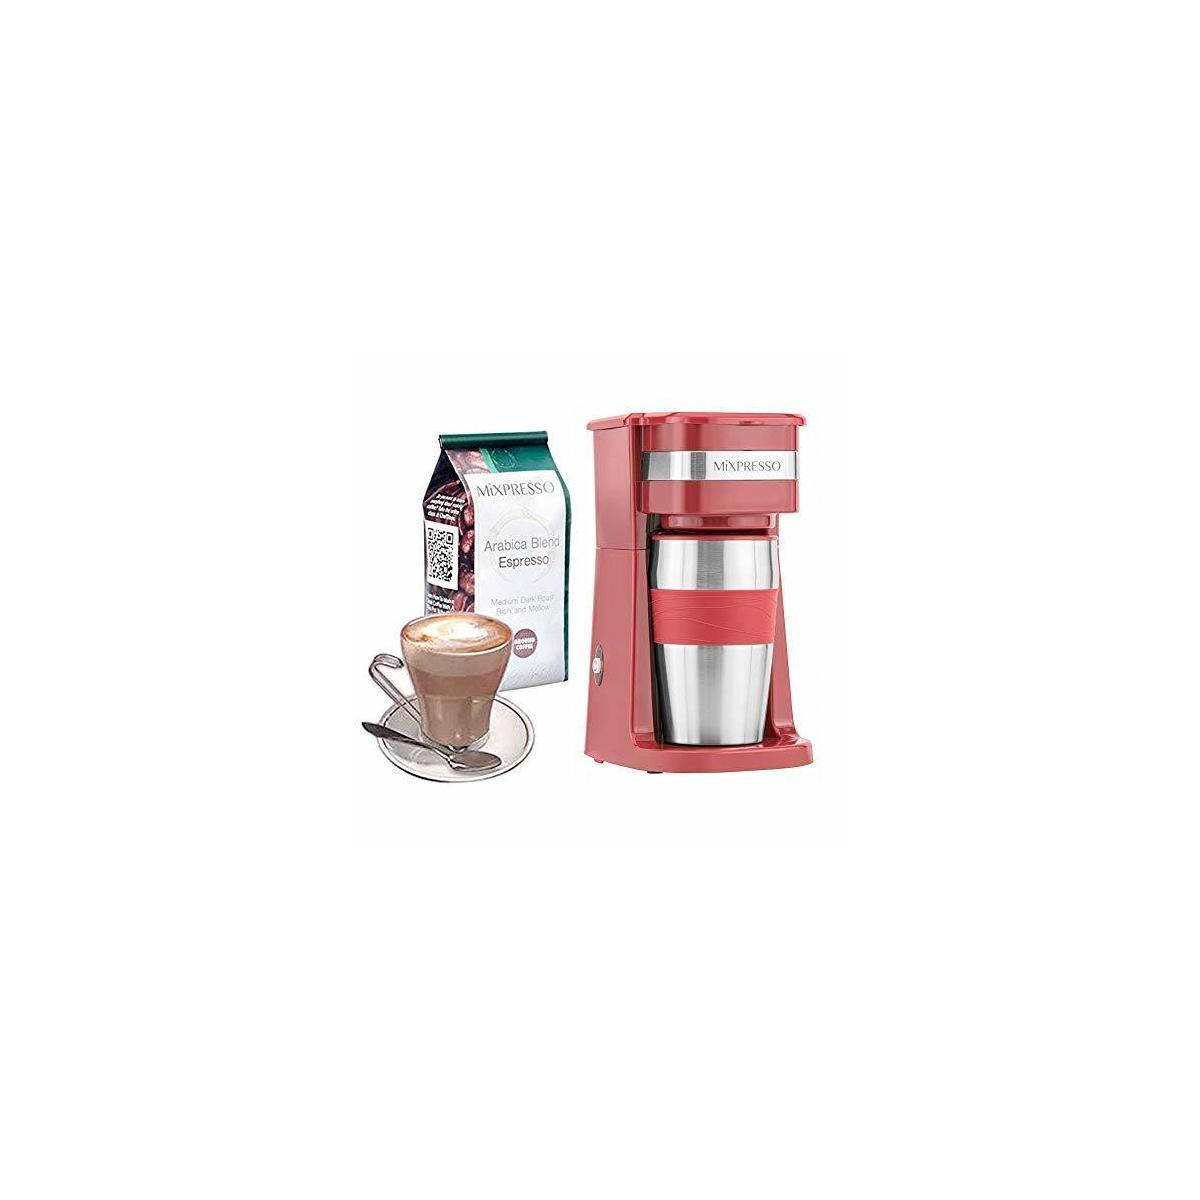 Ultimate 2 In 1 Single Cup Coffee Maker 14oz Travel Mug ...